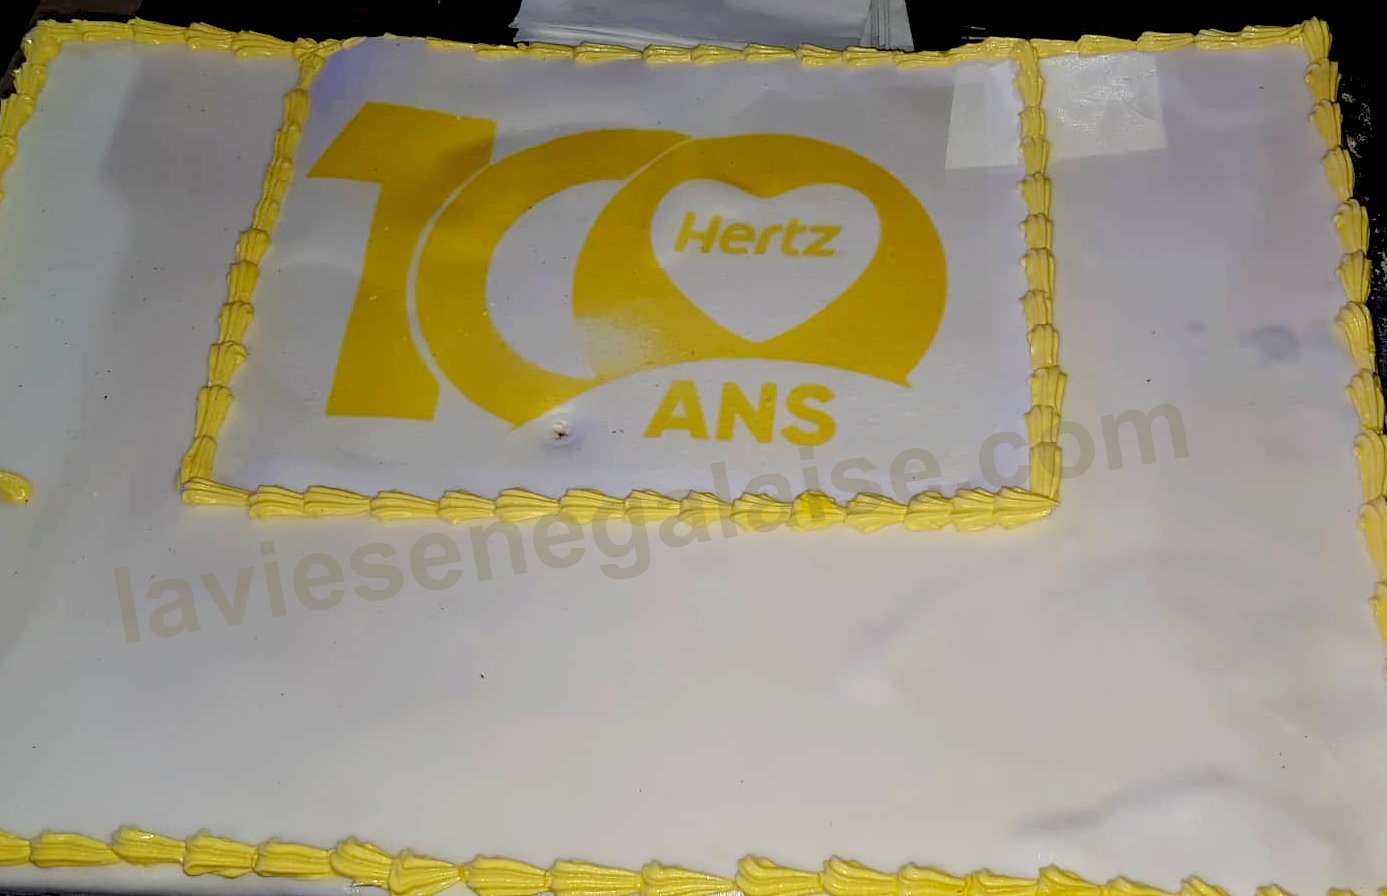 Hertz 100ans International, Hertz Sénégal 40 ans, anniversaire